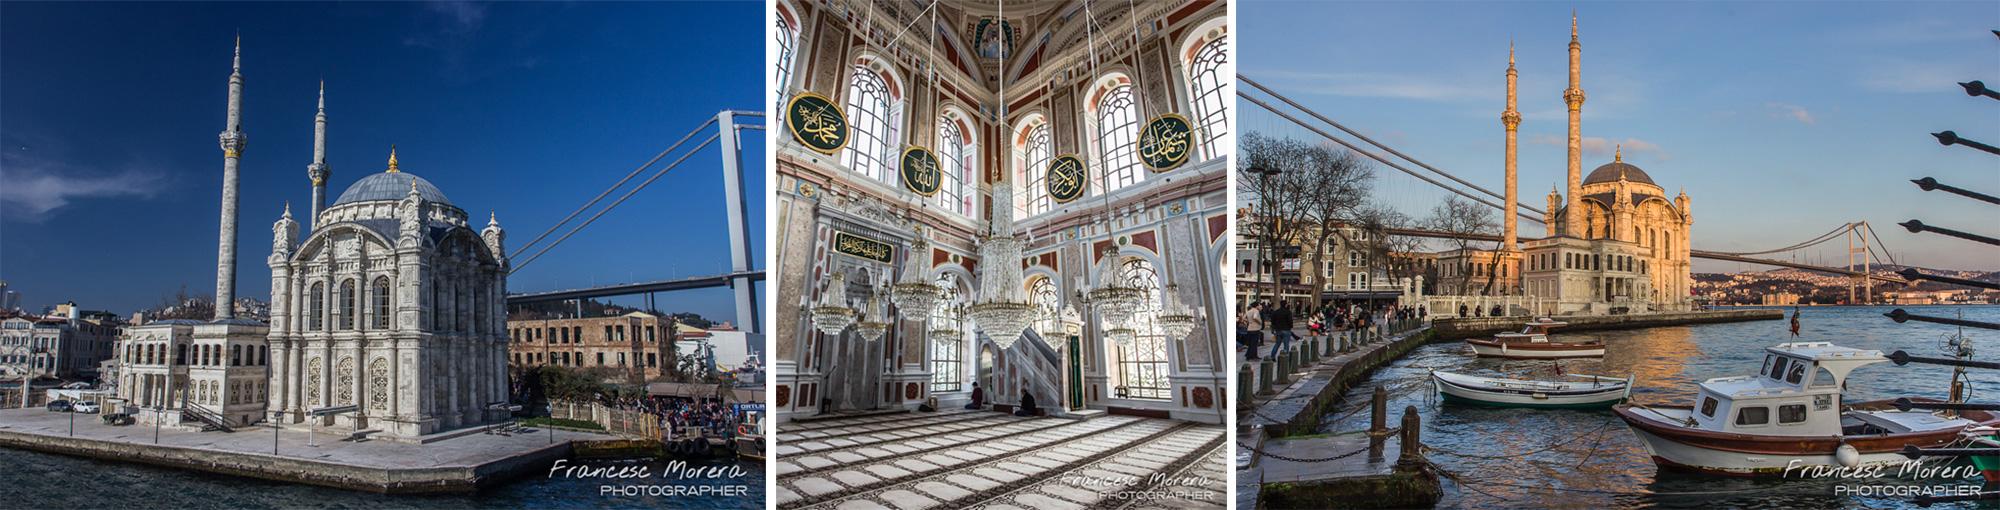 mezquita_ortakoy